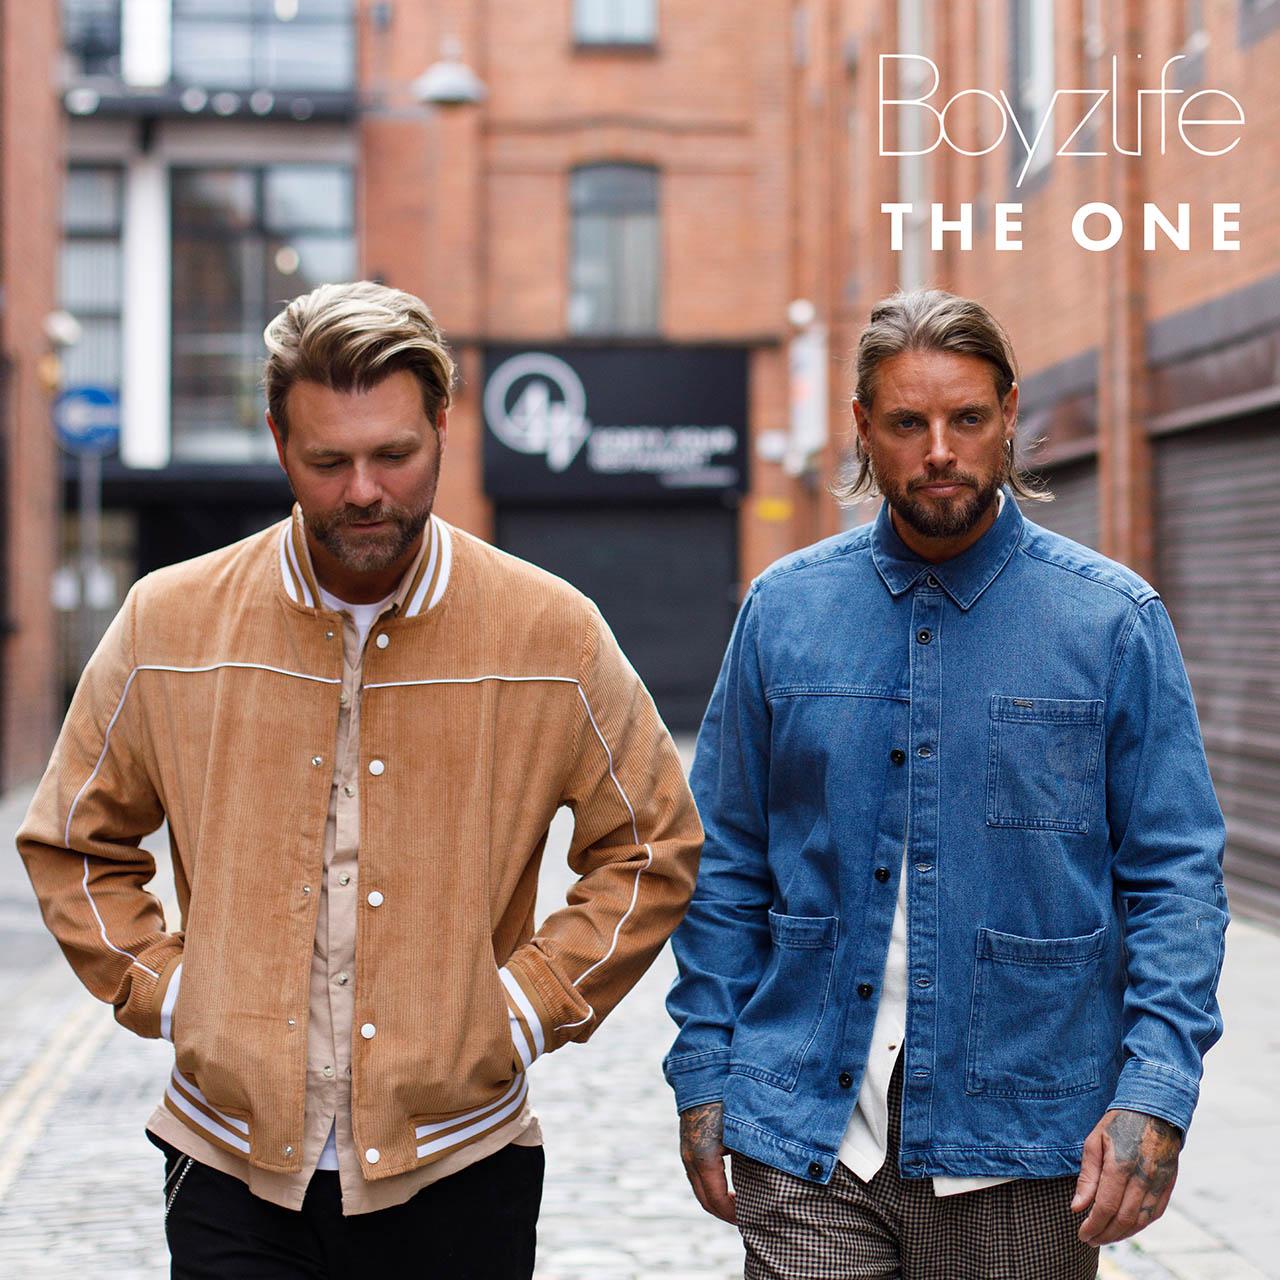 Boyzlife - The One